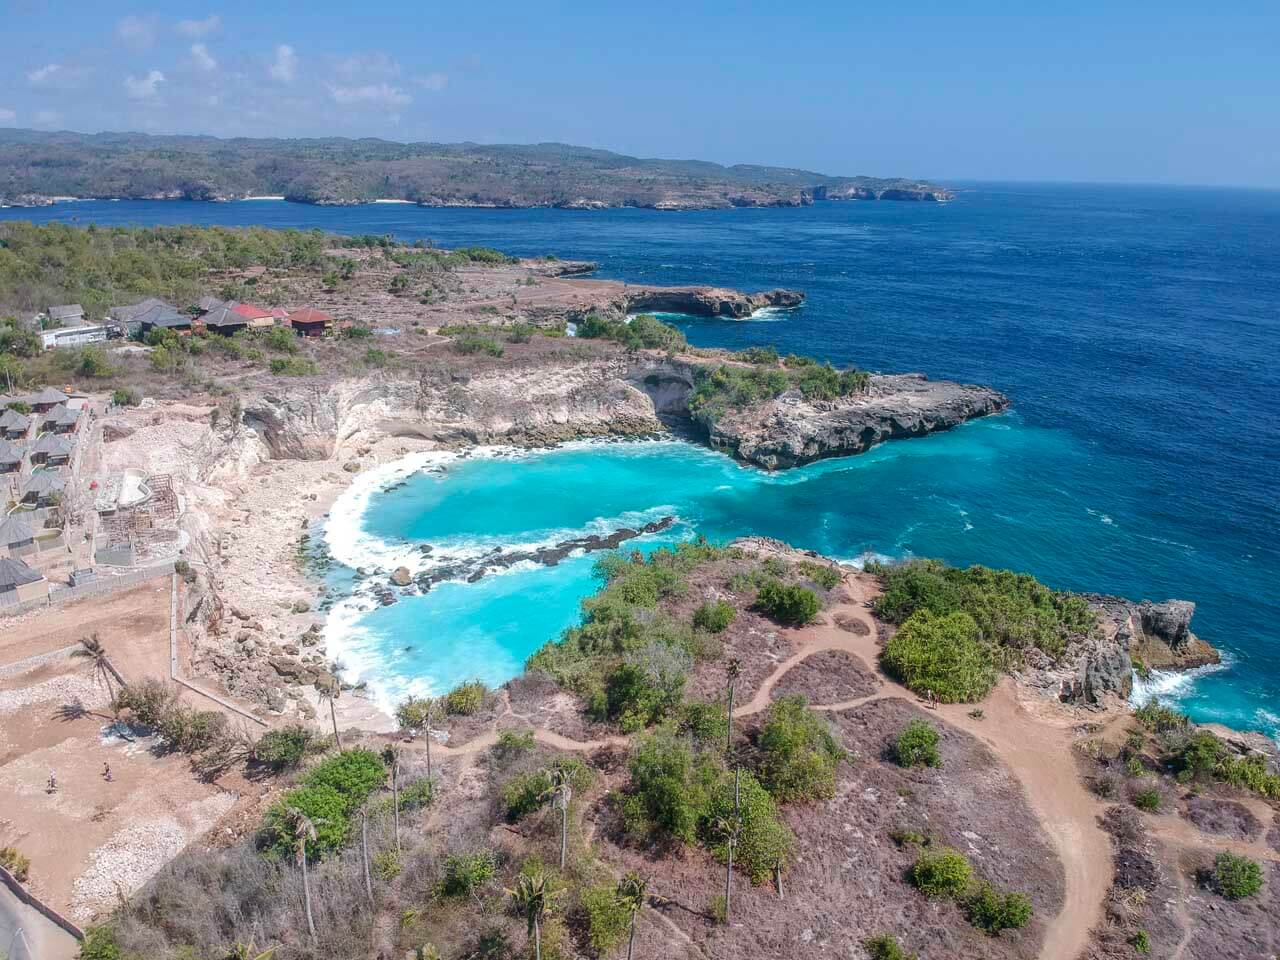 Foto aérea da Blue Lagoon em Nusa Ceningan